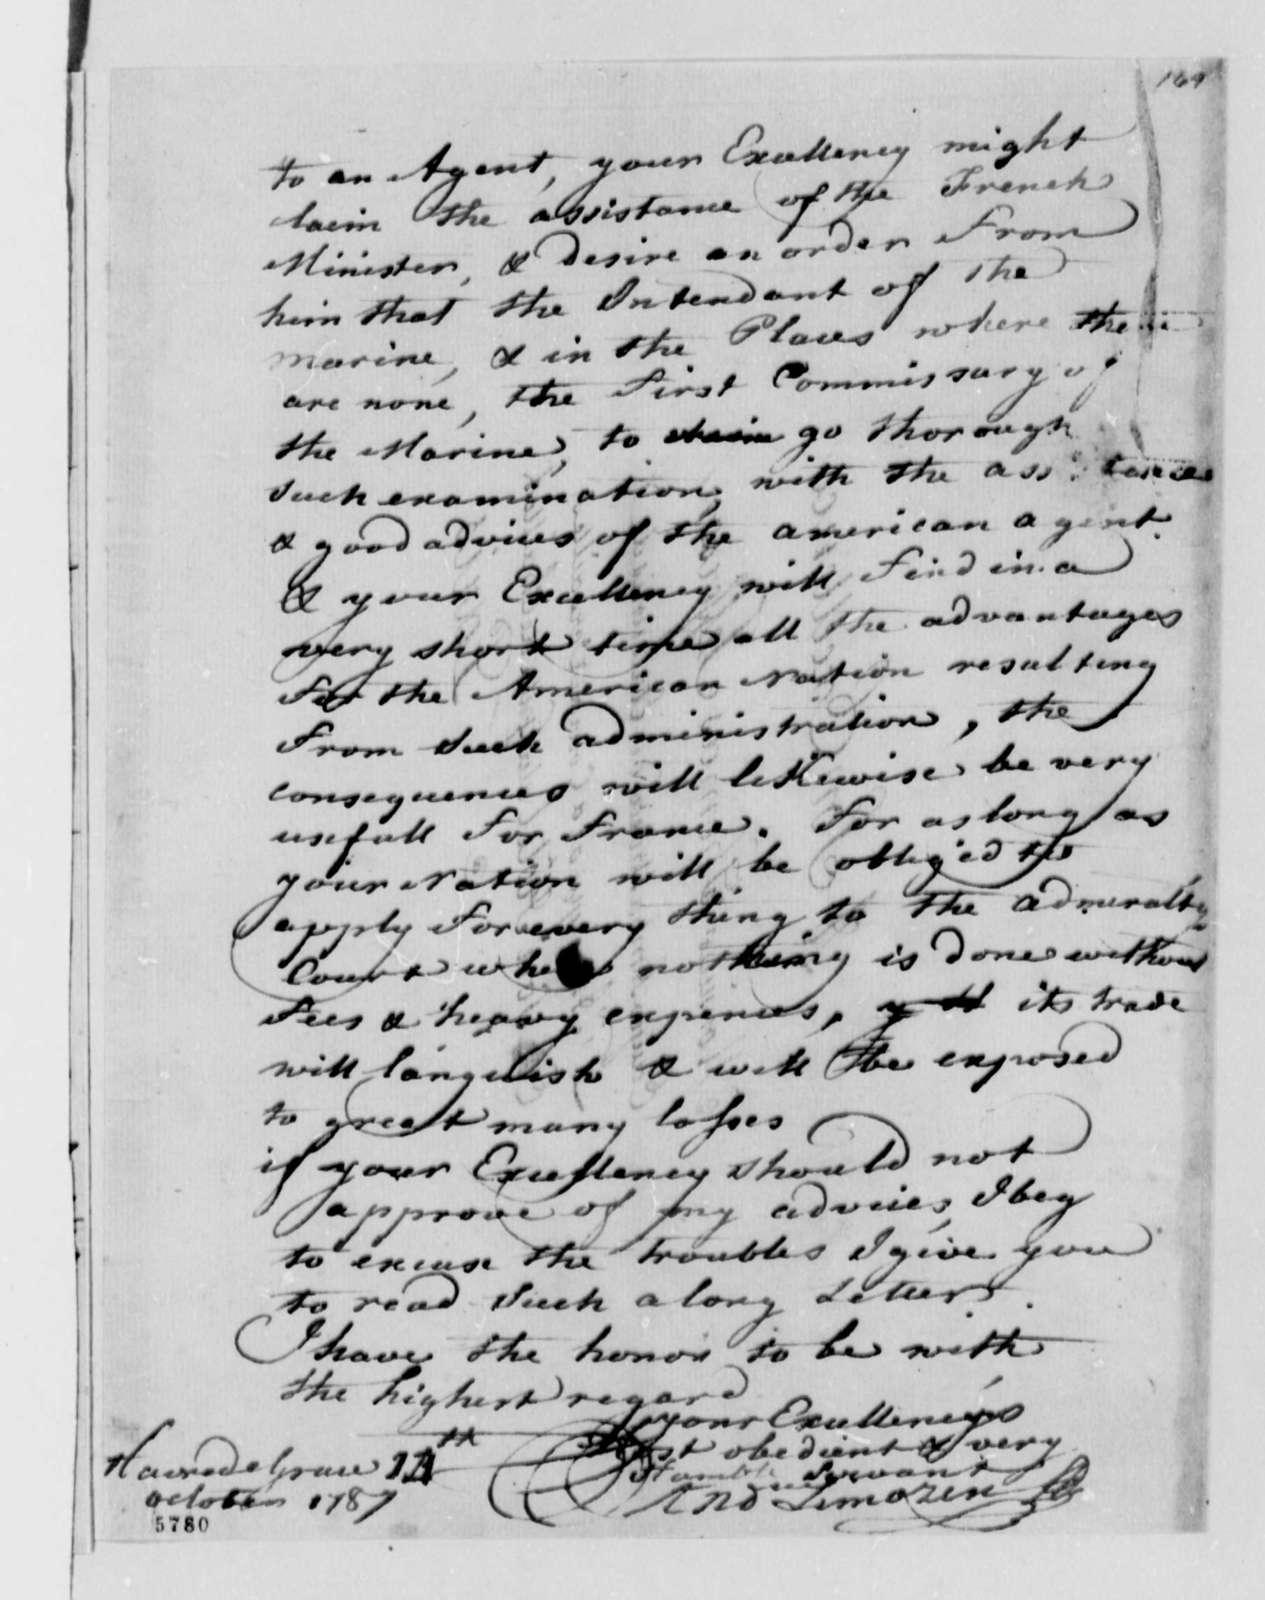 Andre Limozin to Thomas Jefferson, October 14, 1787